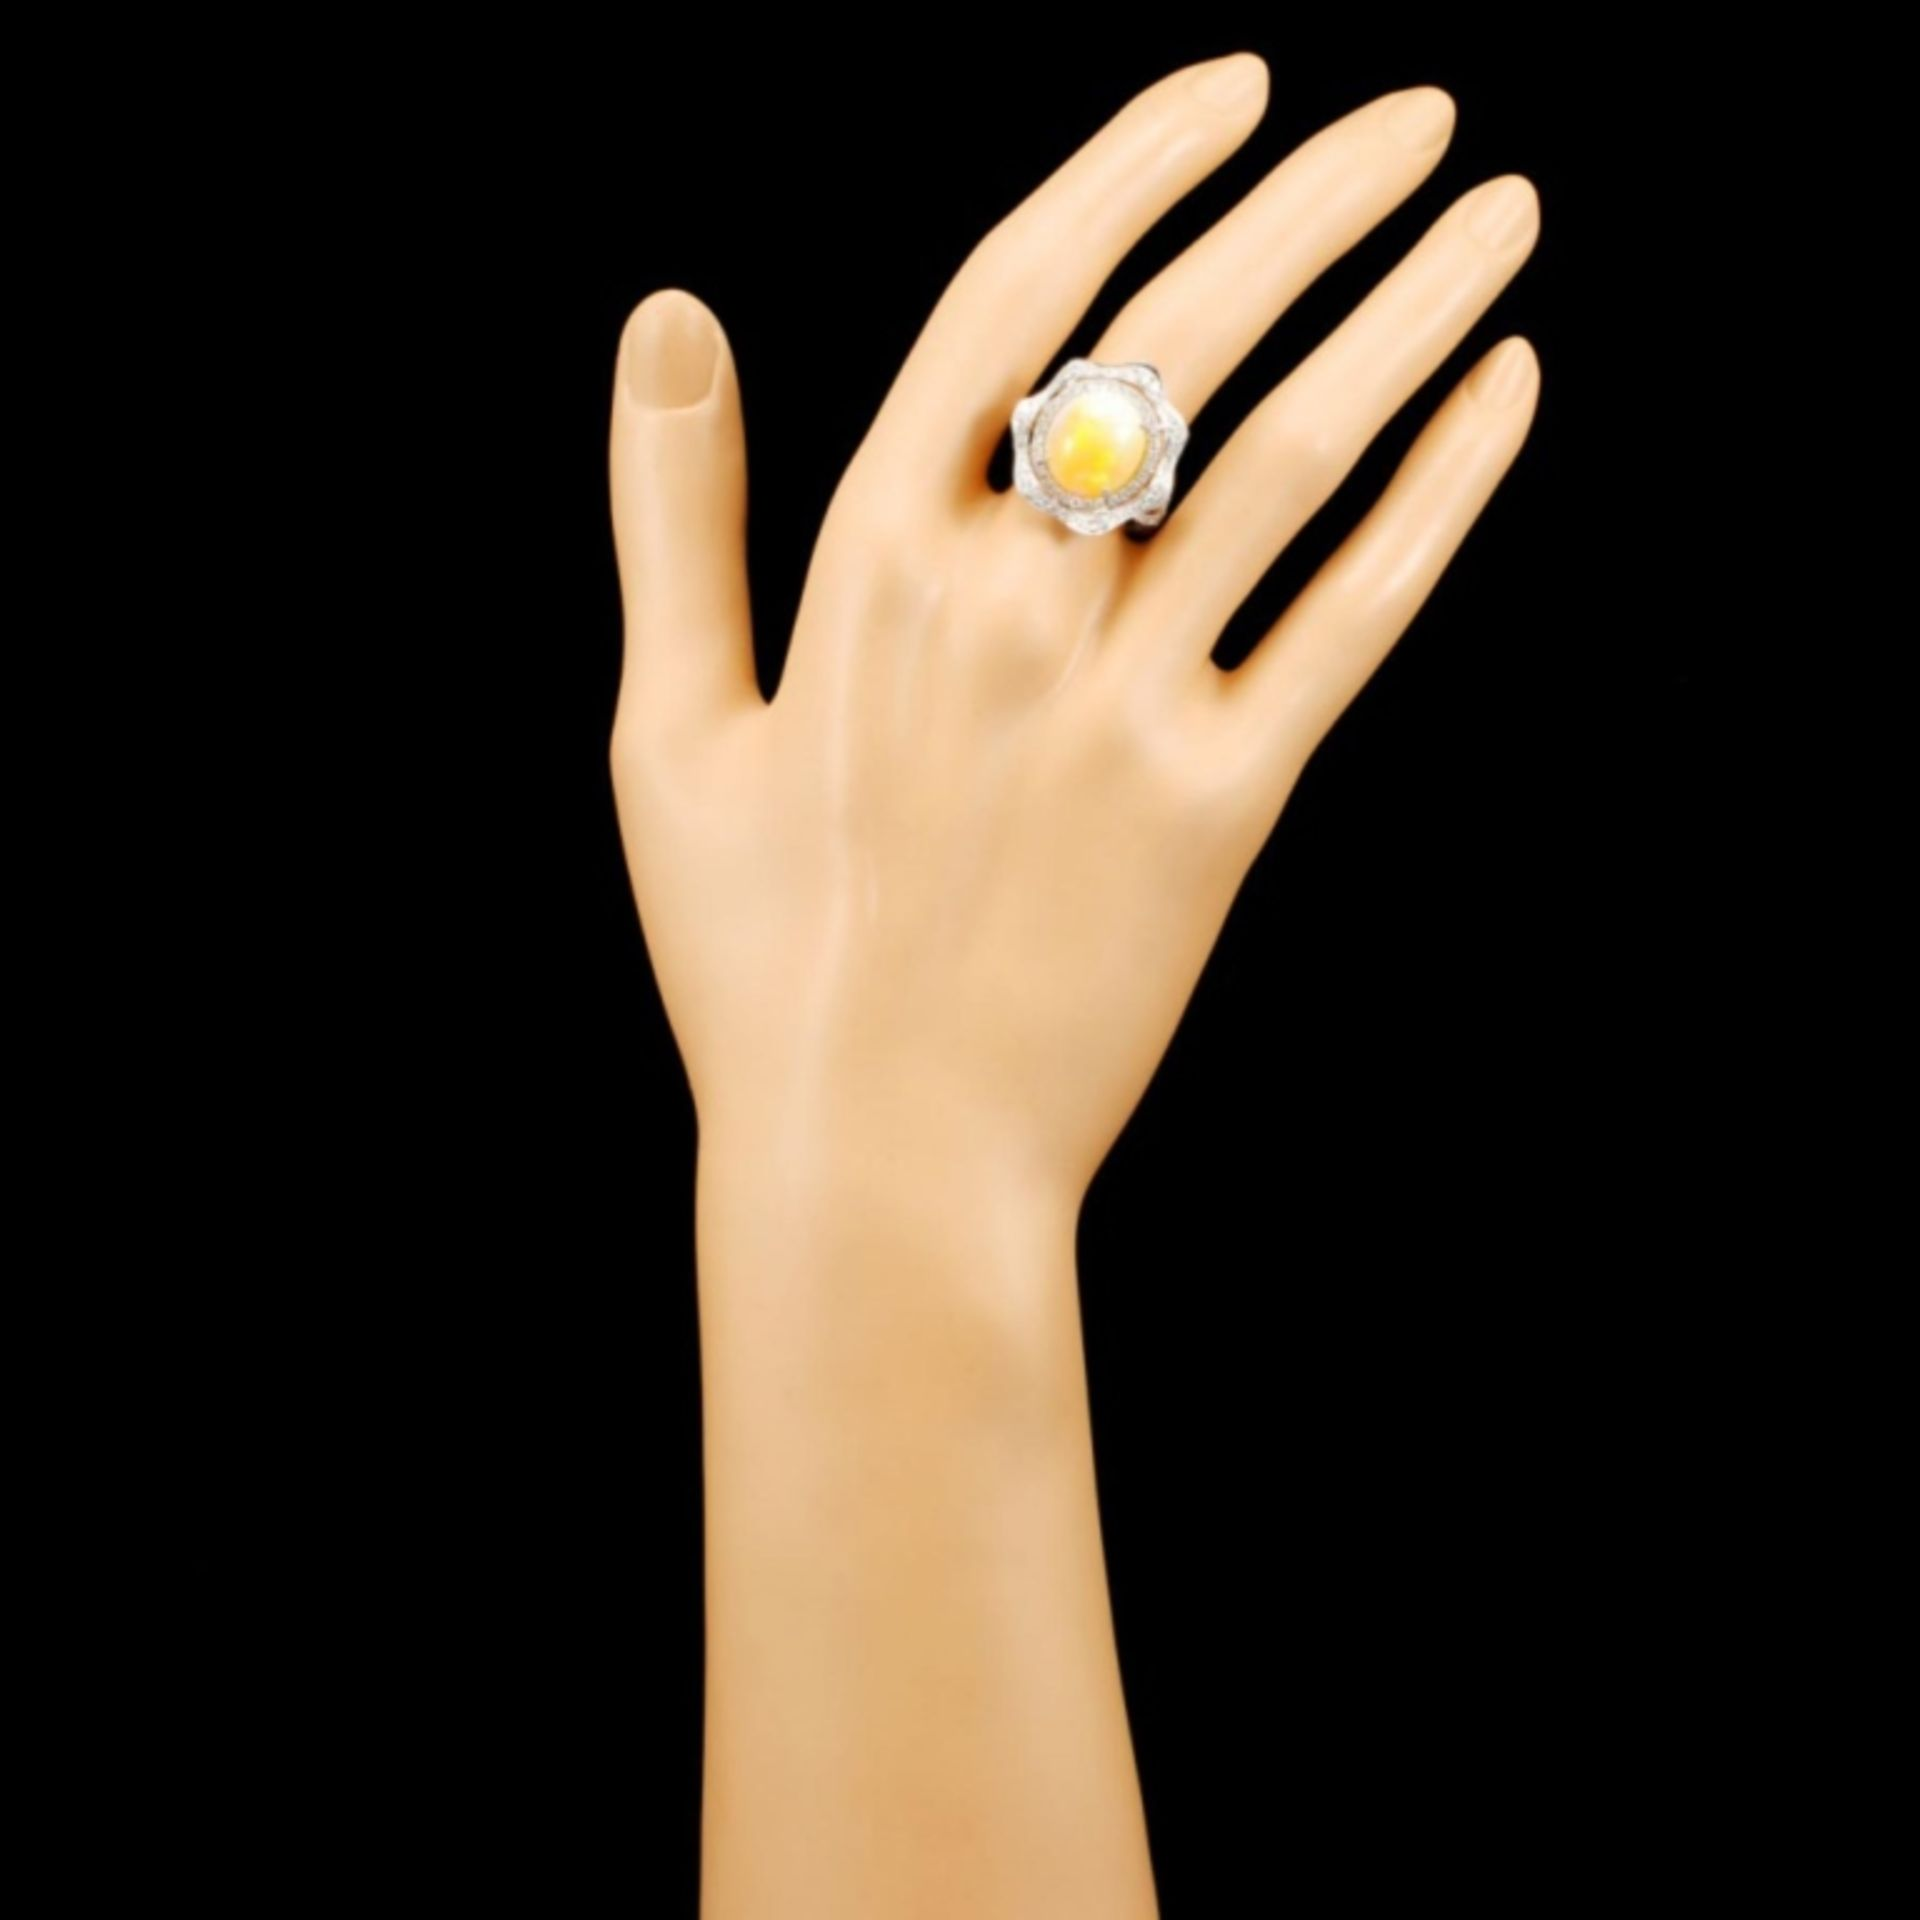 14K Gold 5.27ct Opal & 0.90ctw Diamond Ring - Image 4 of 4